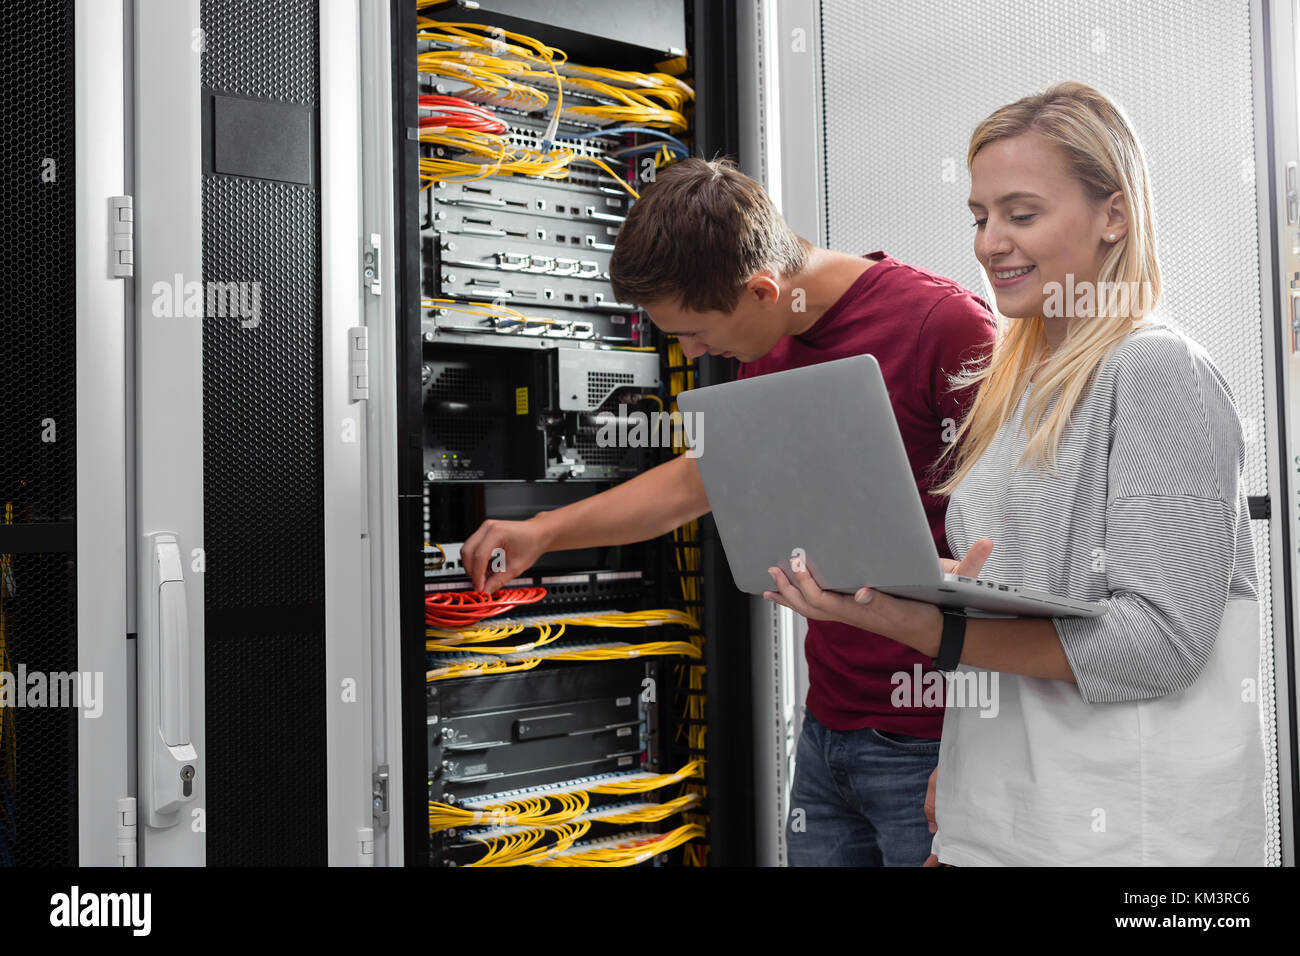 team of busienss people working in server room Stock Photo